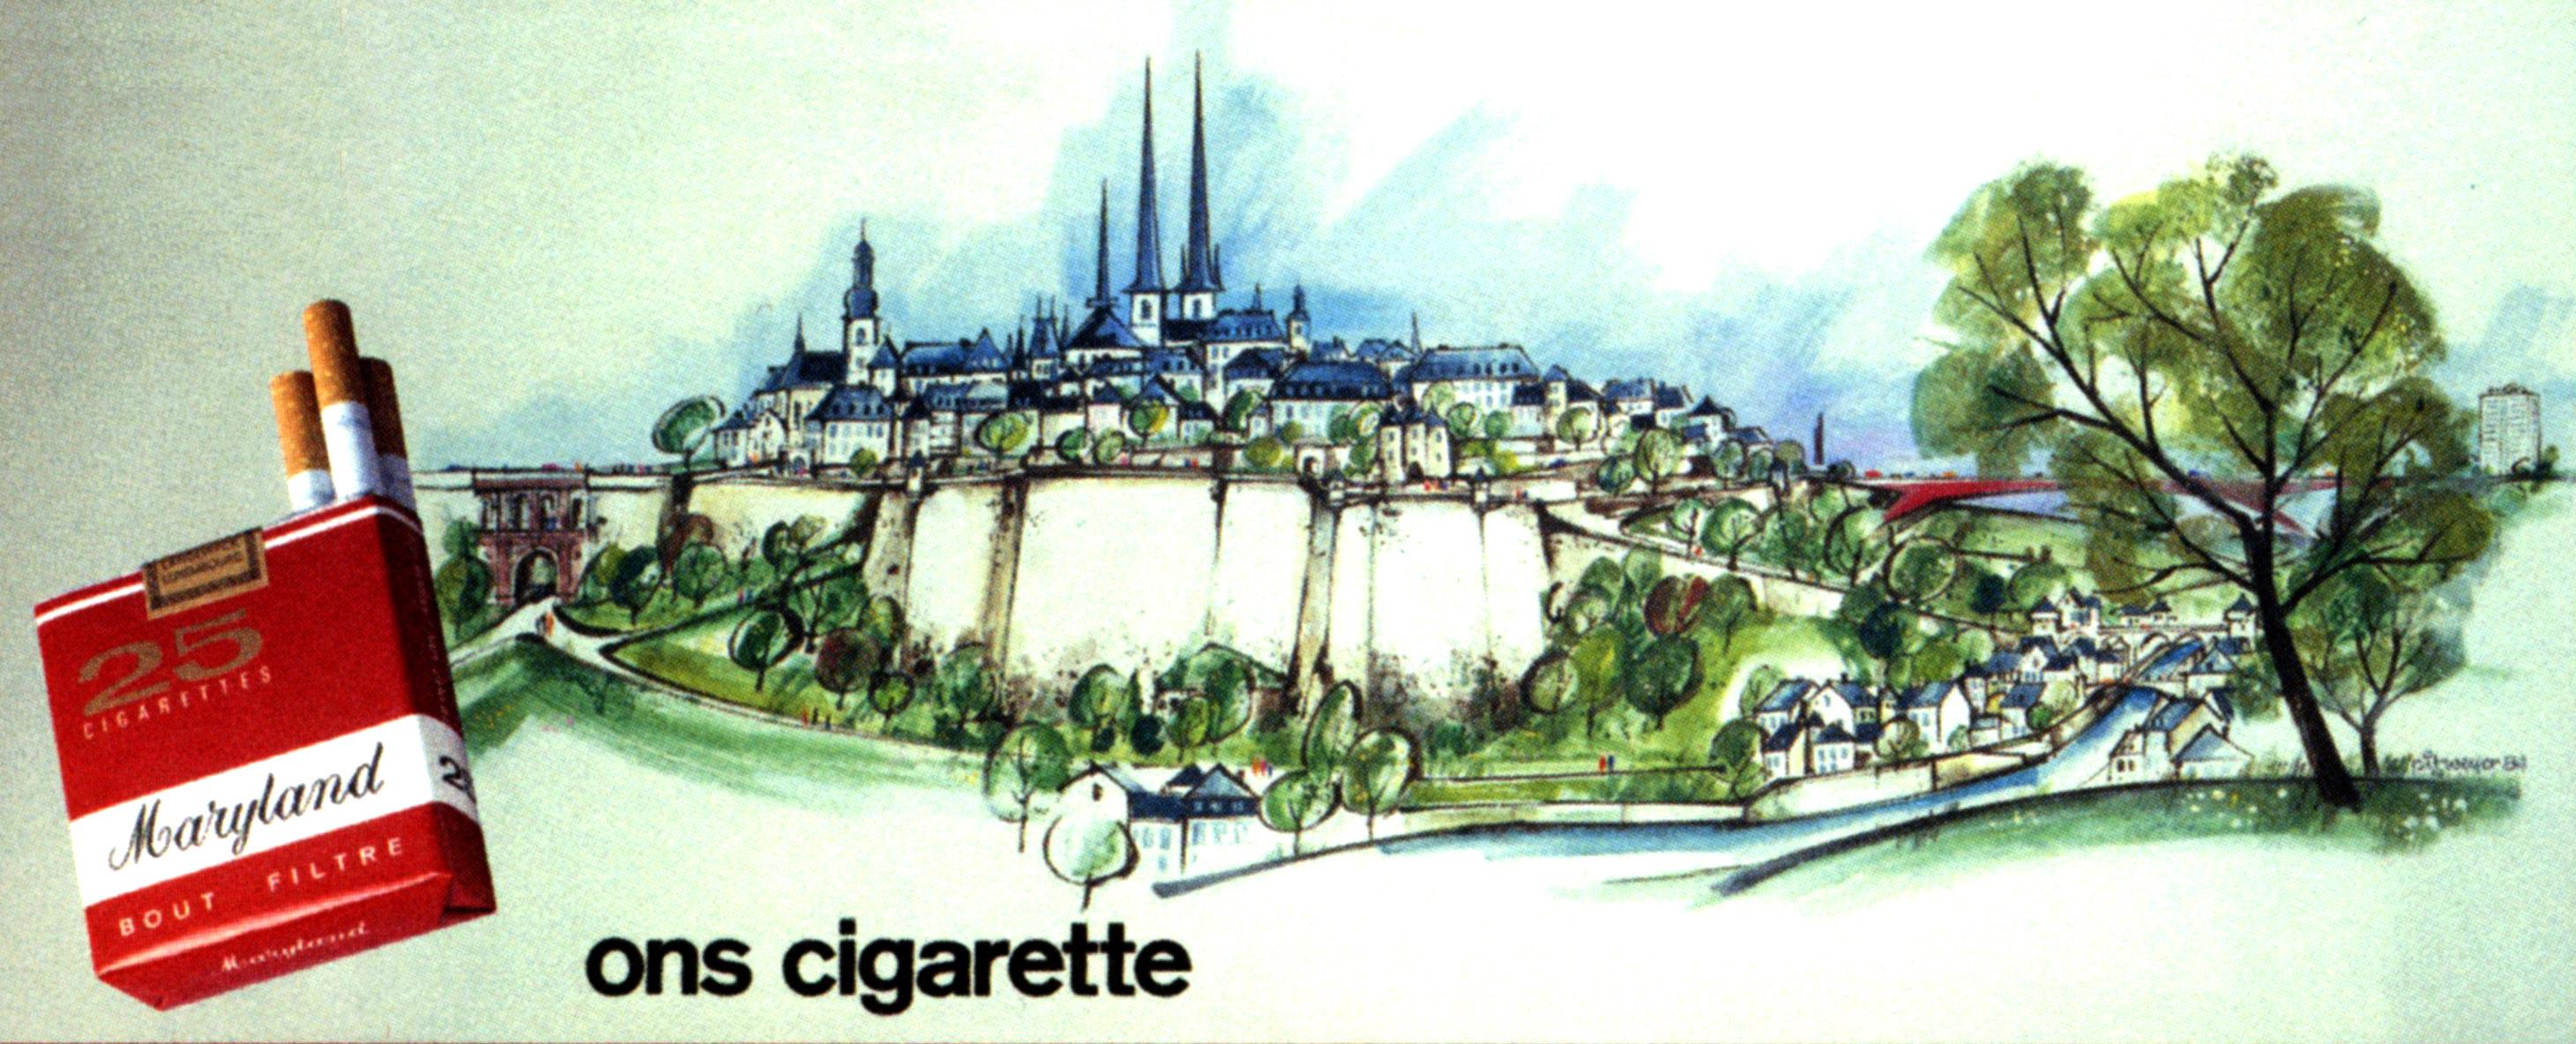 grand panneau pour Heintz van Landewyck - cigarettes Maryland 1983 Pit Weyer